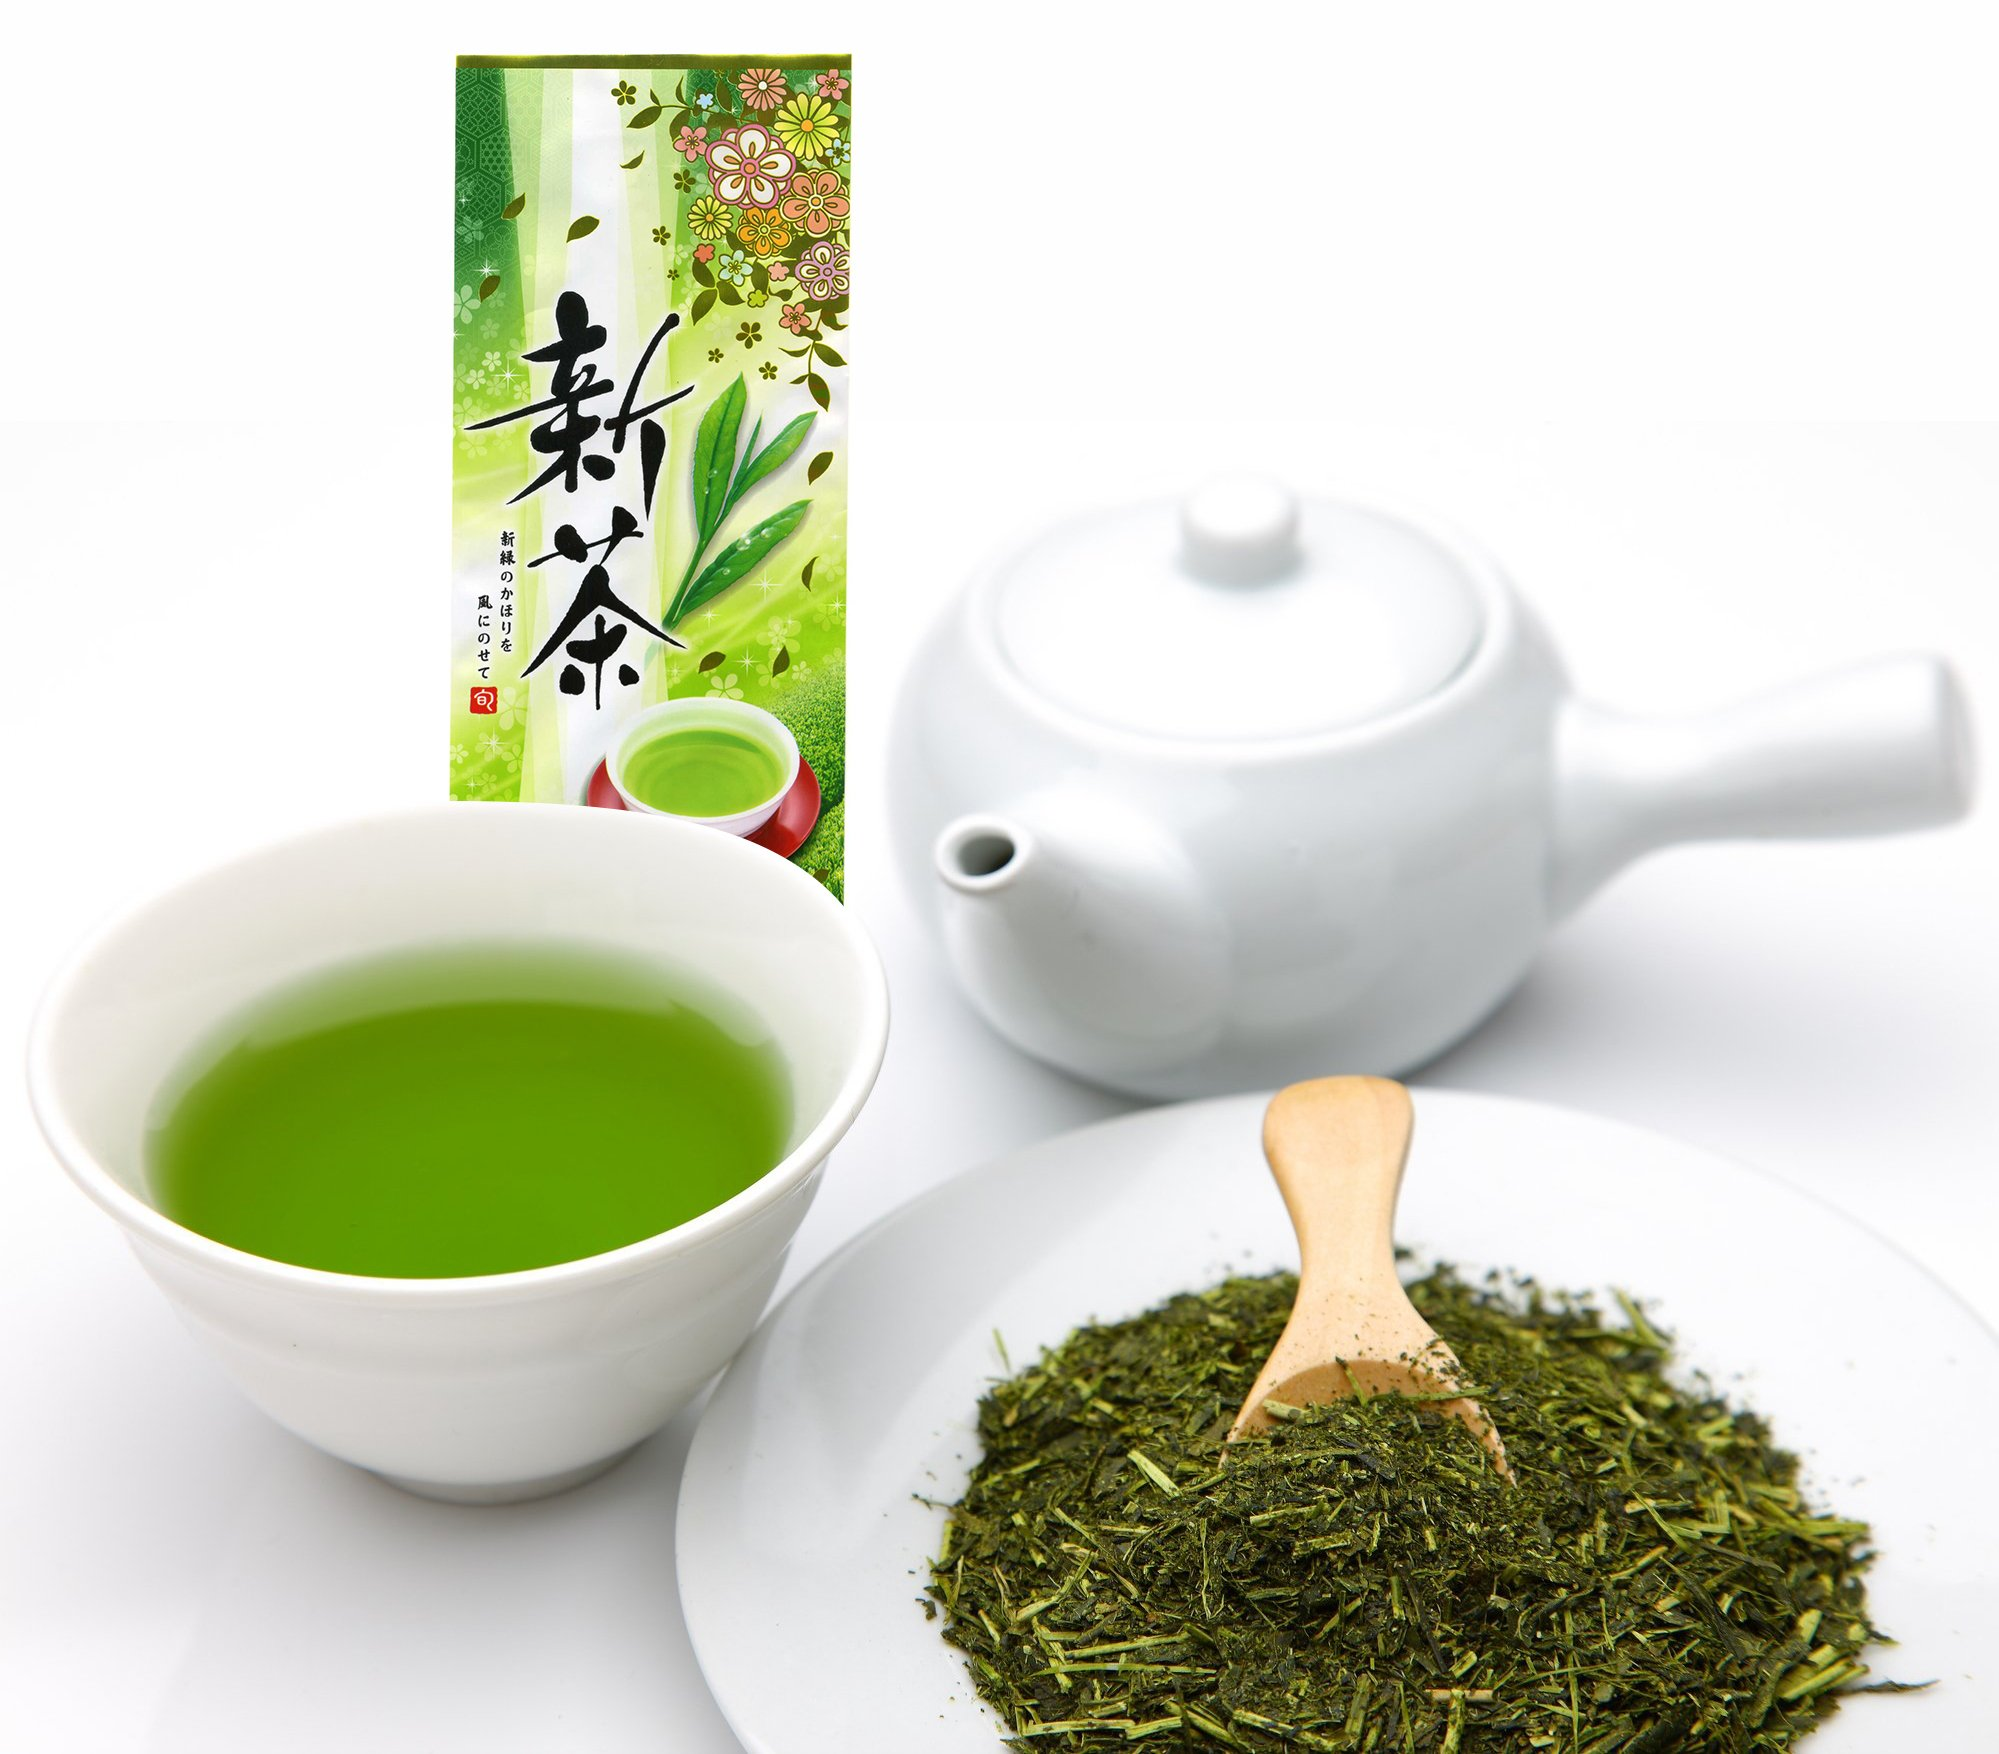 【予約】八十八夜摘み新茶100g入×2本・八女の新茶100g入(白折)×3本+新茶(特上)1本サービス